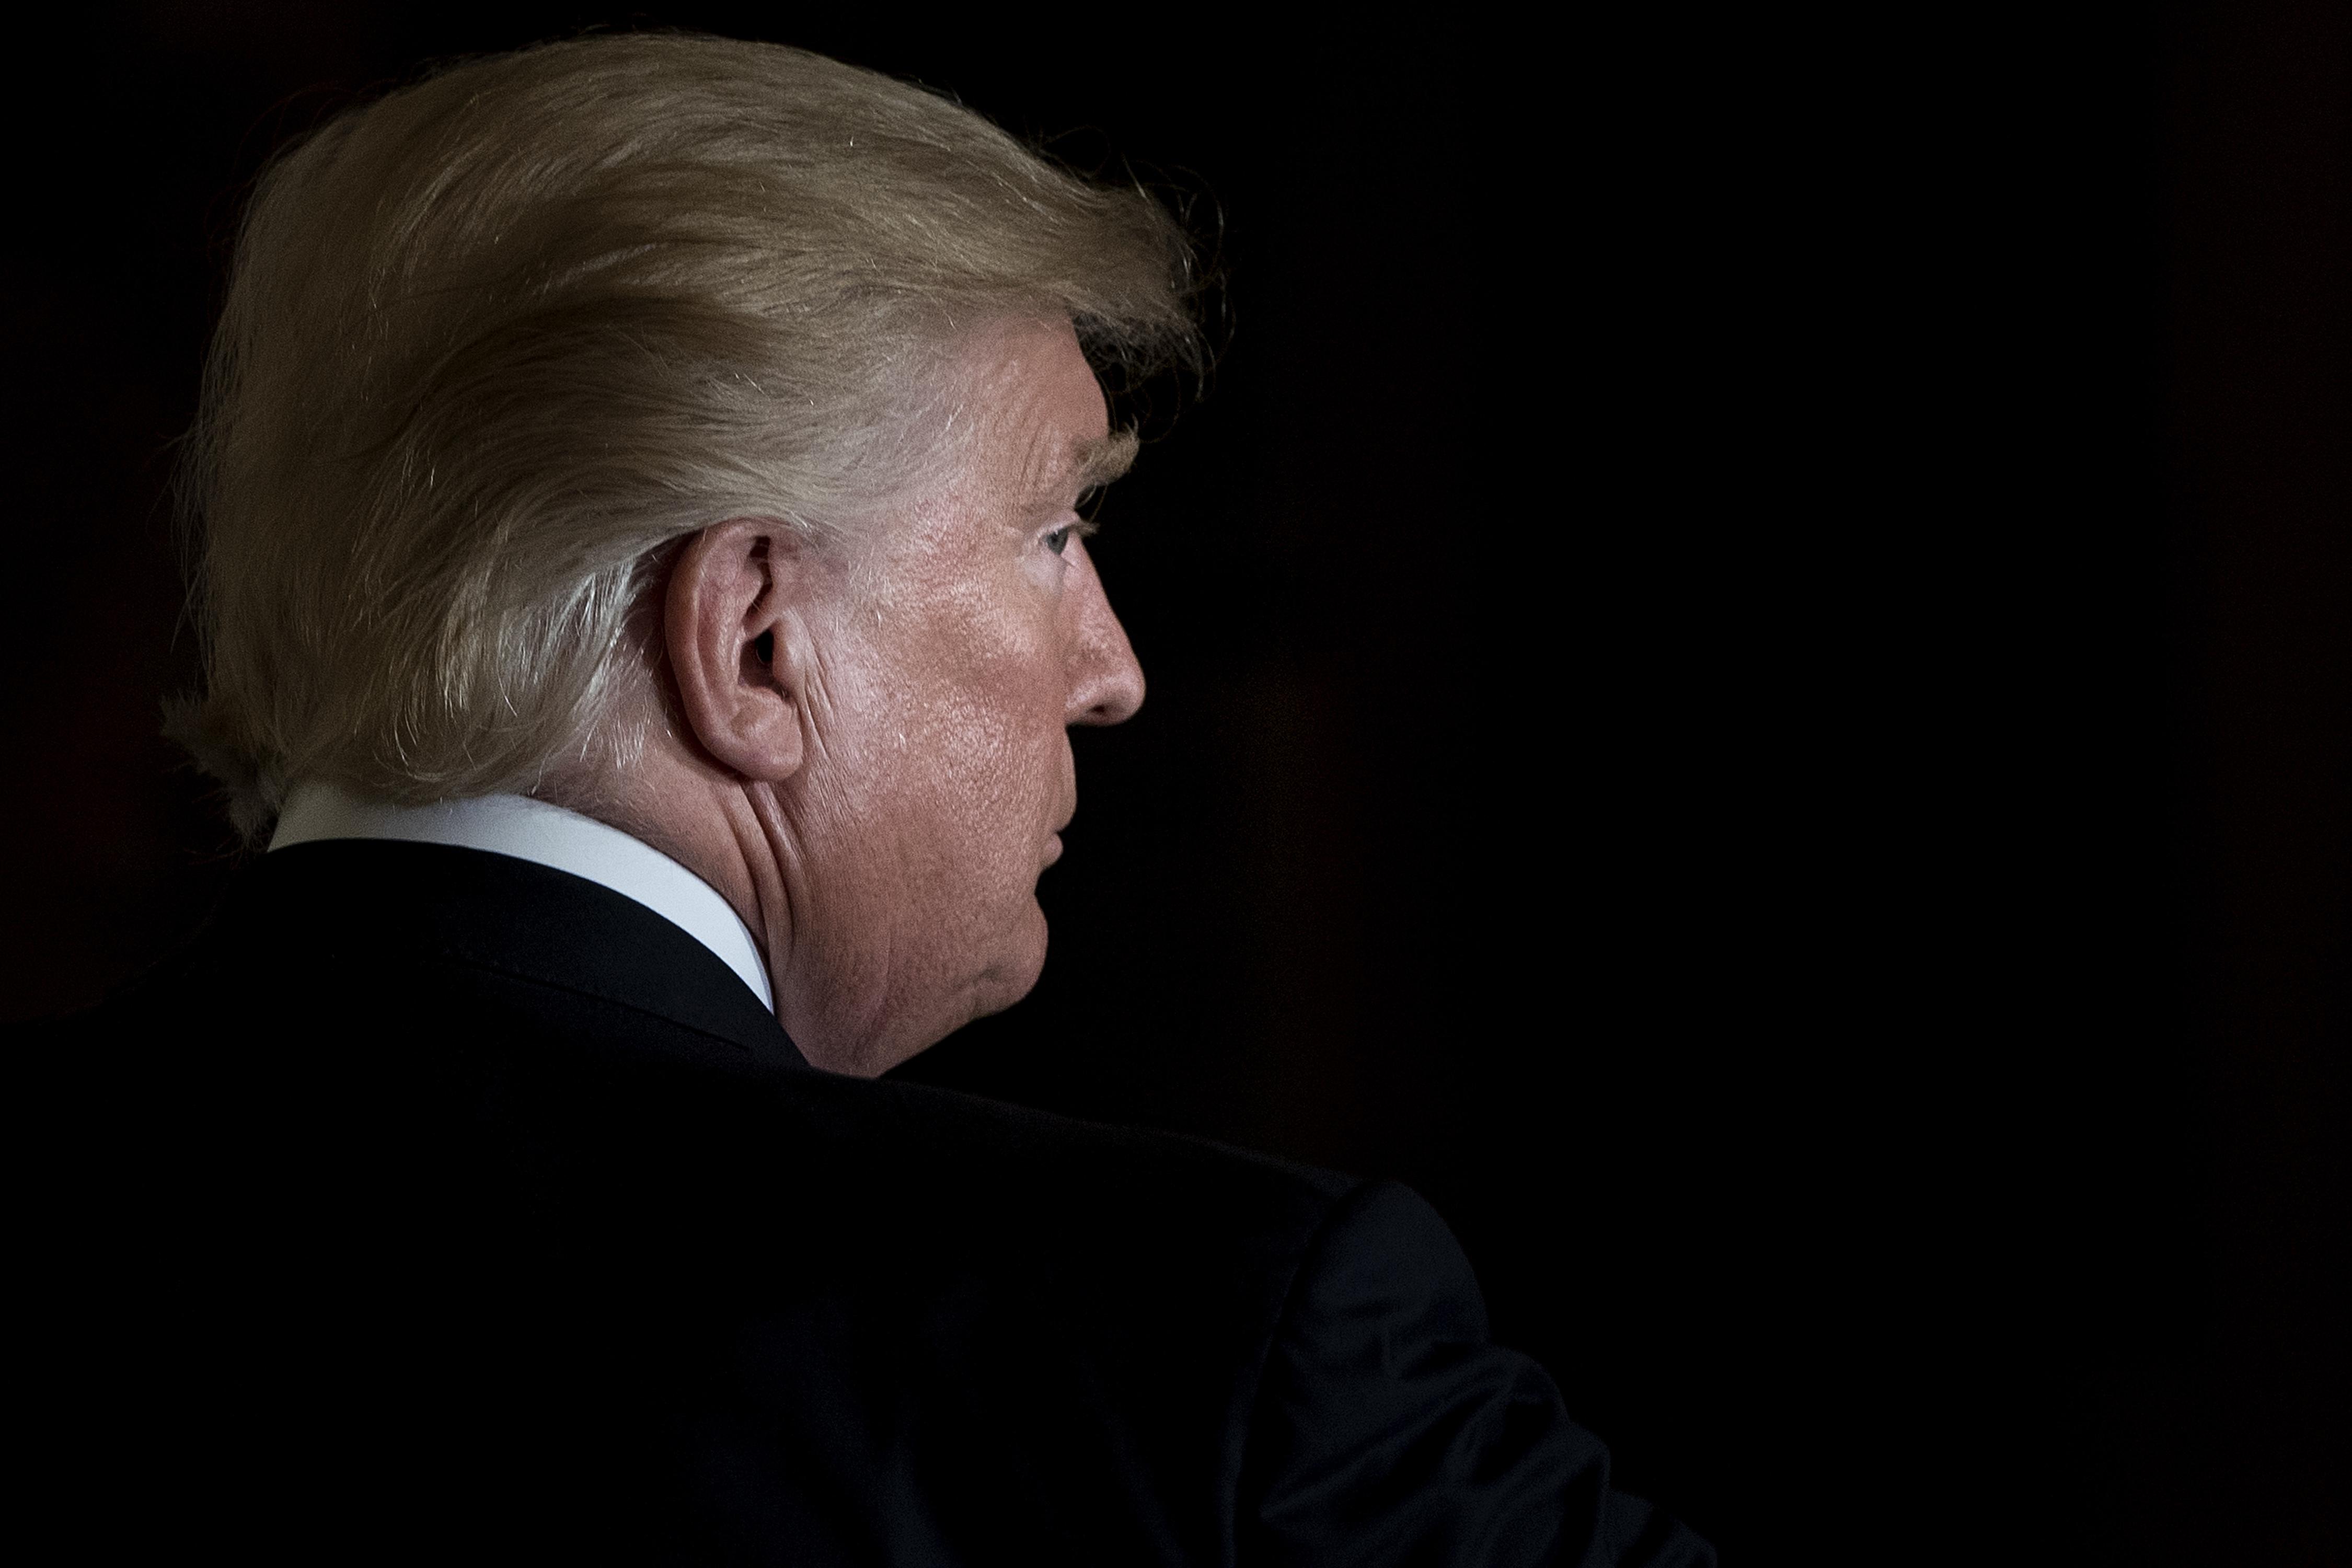 ACLU raises concerns amid Trump Twitter ban